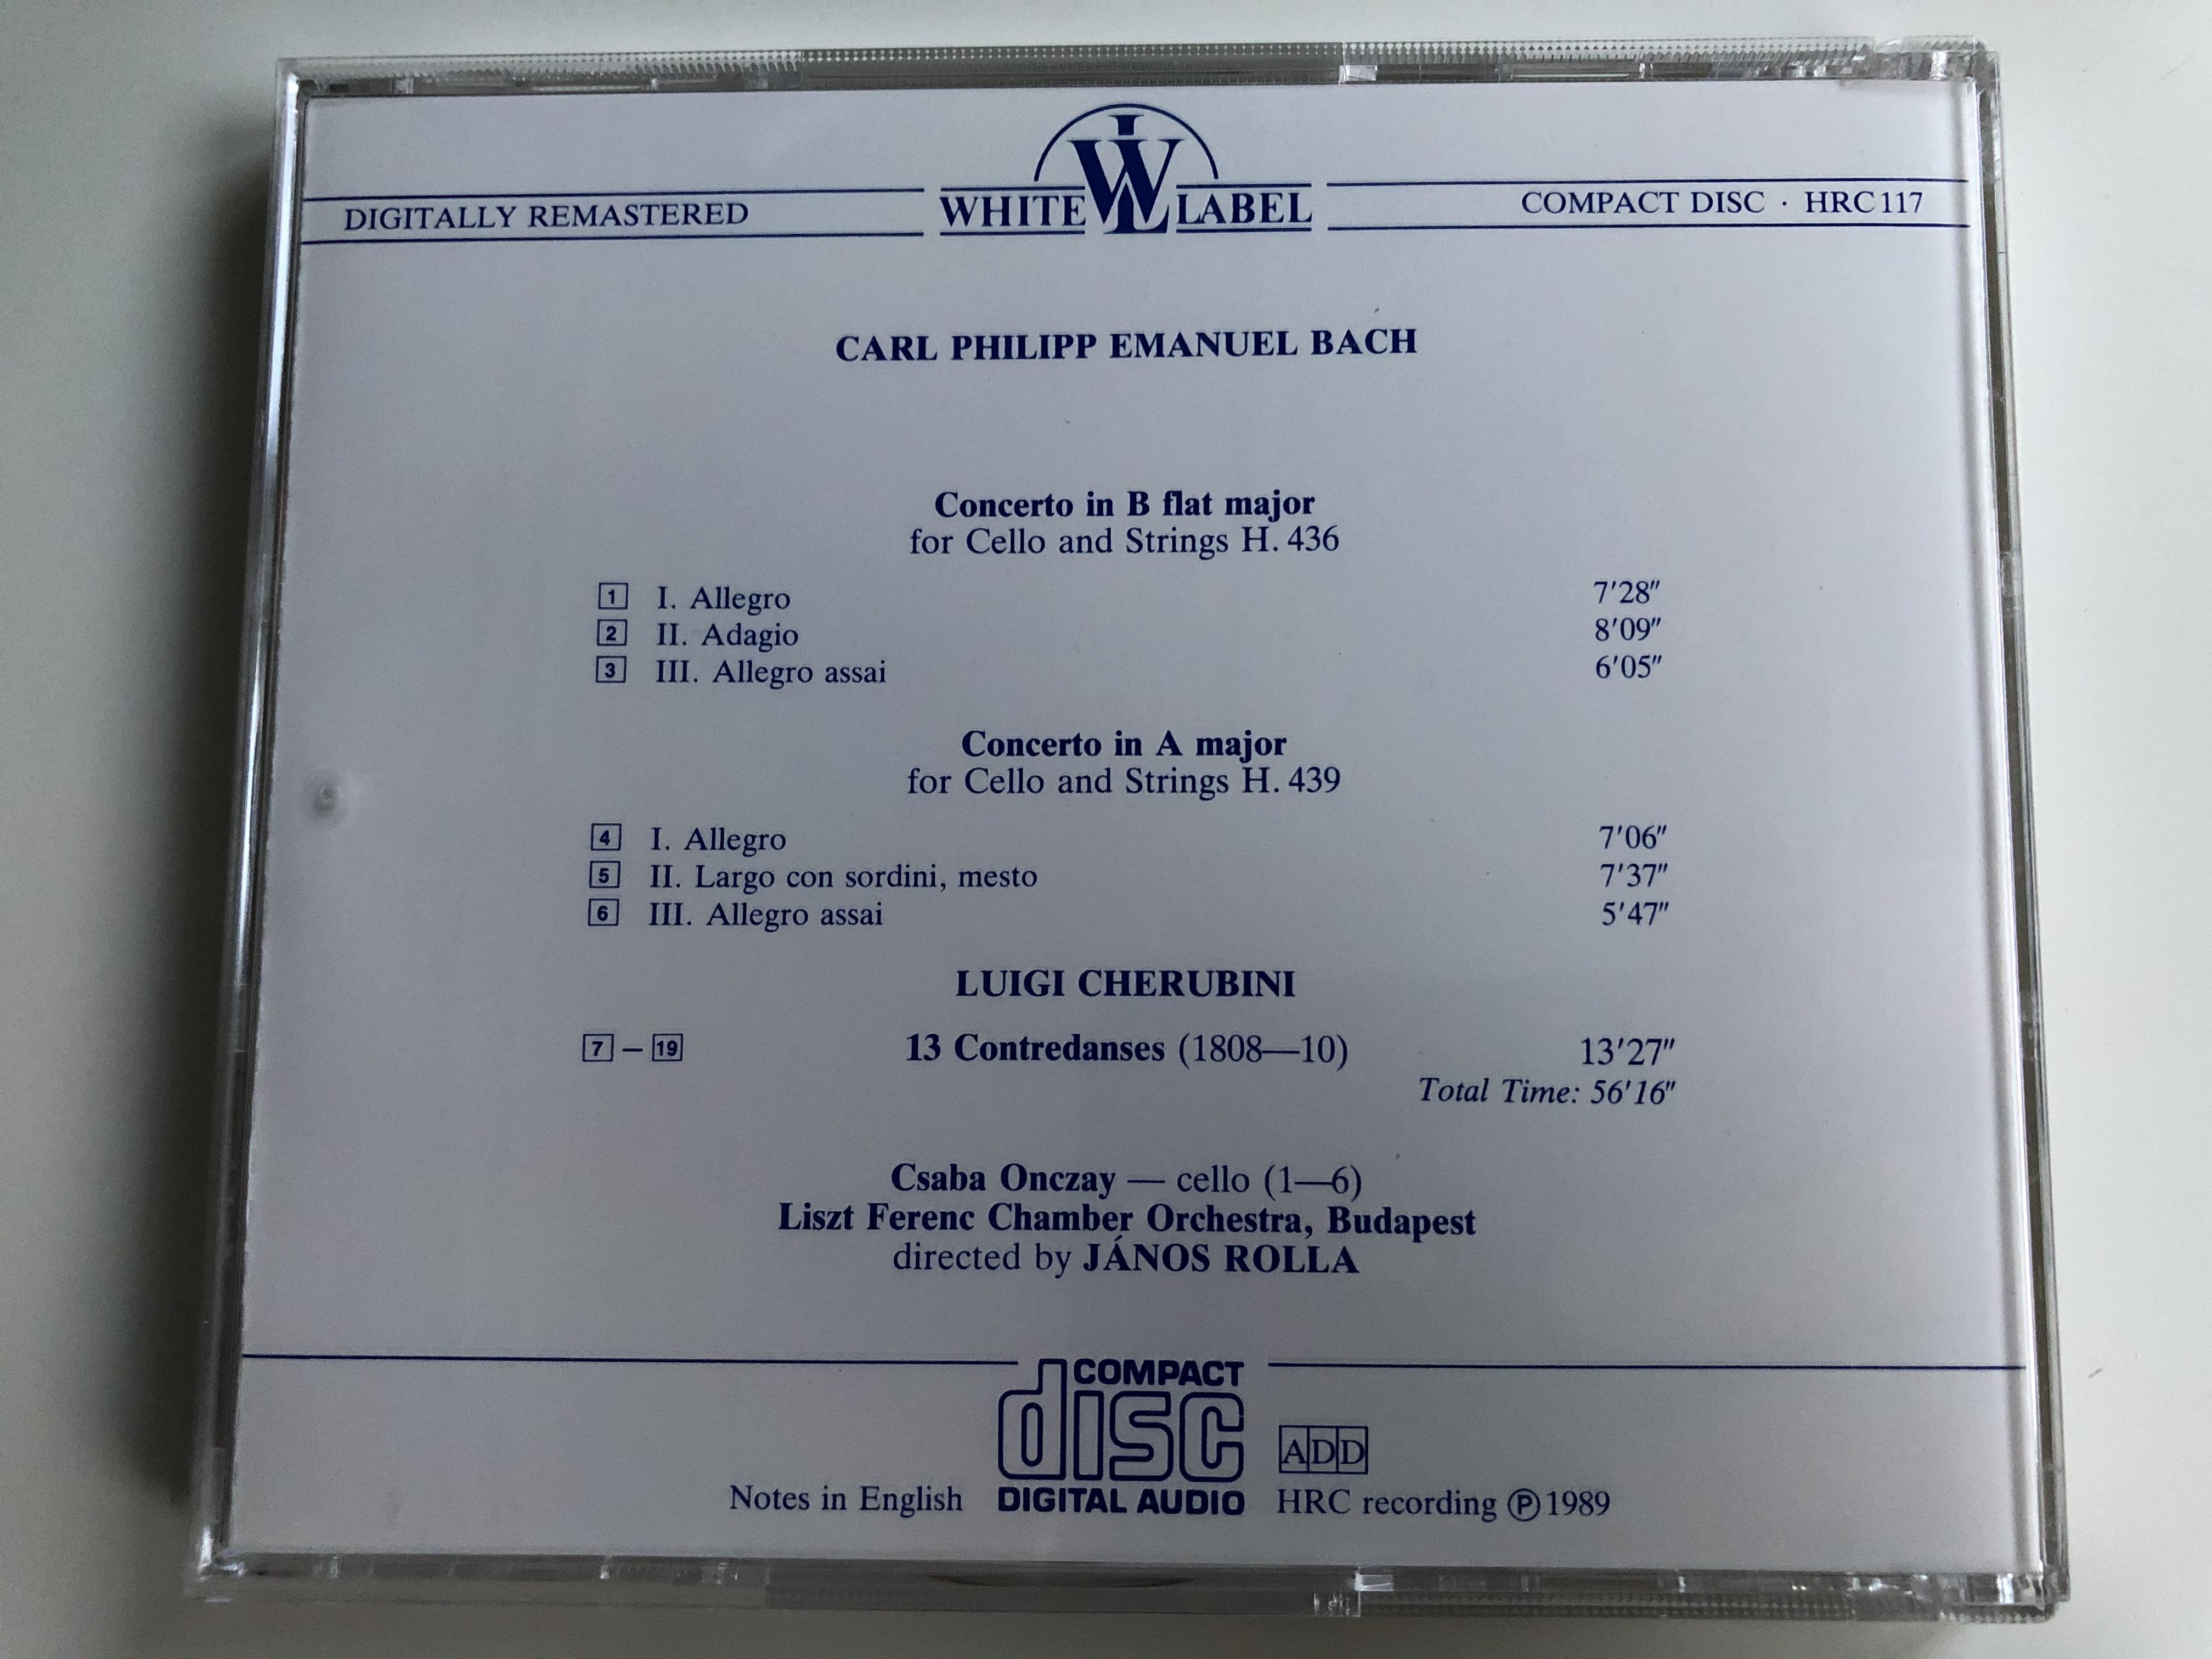 c.p.e.-bach-cello-concertos-cherubin-13-contredanses-csaba-onczay-liszt-ferenc-chamber-orchestra-white-label-audio-cd-1989-stereo-hrc-117-6-.jpg